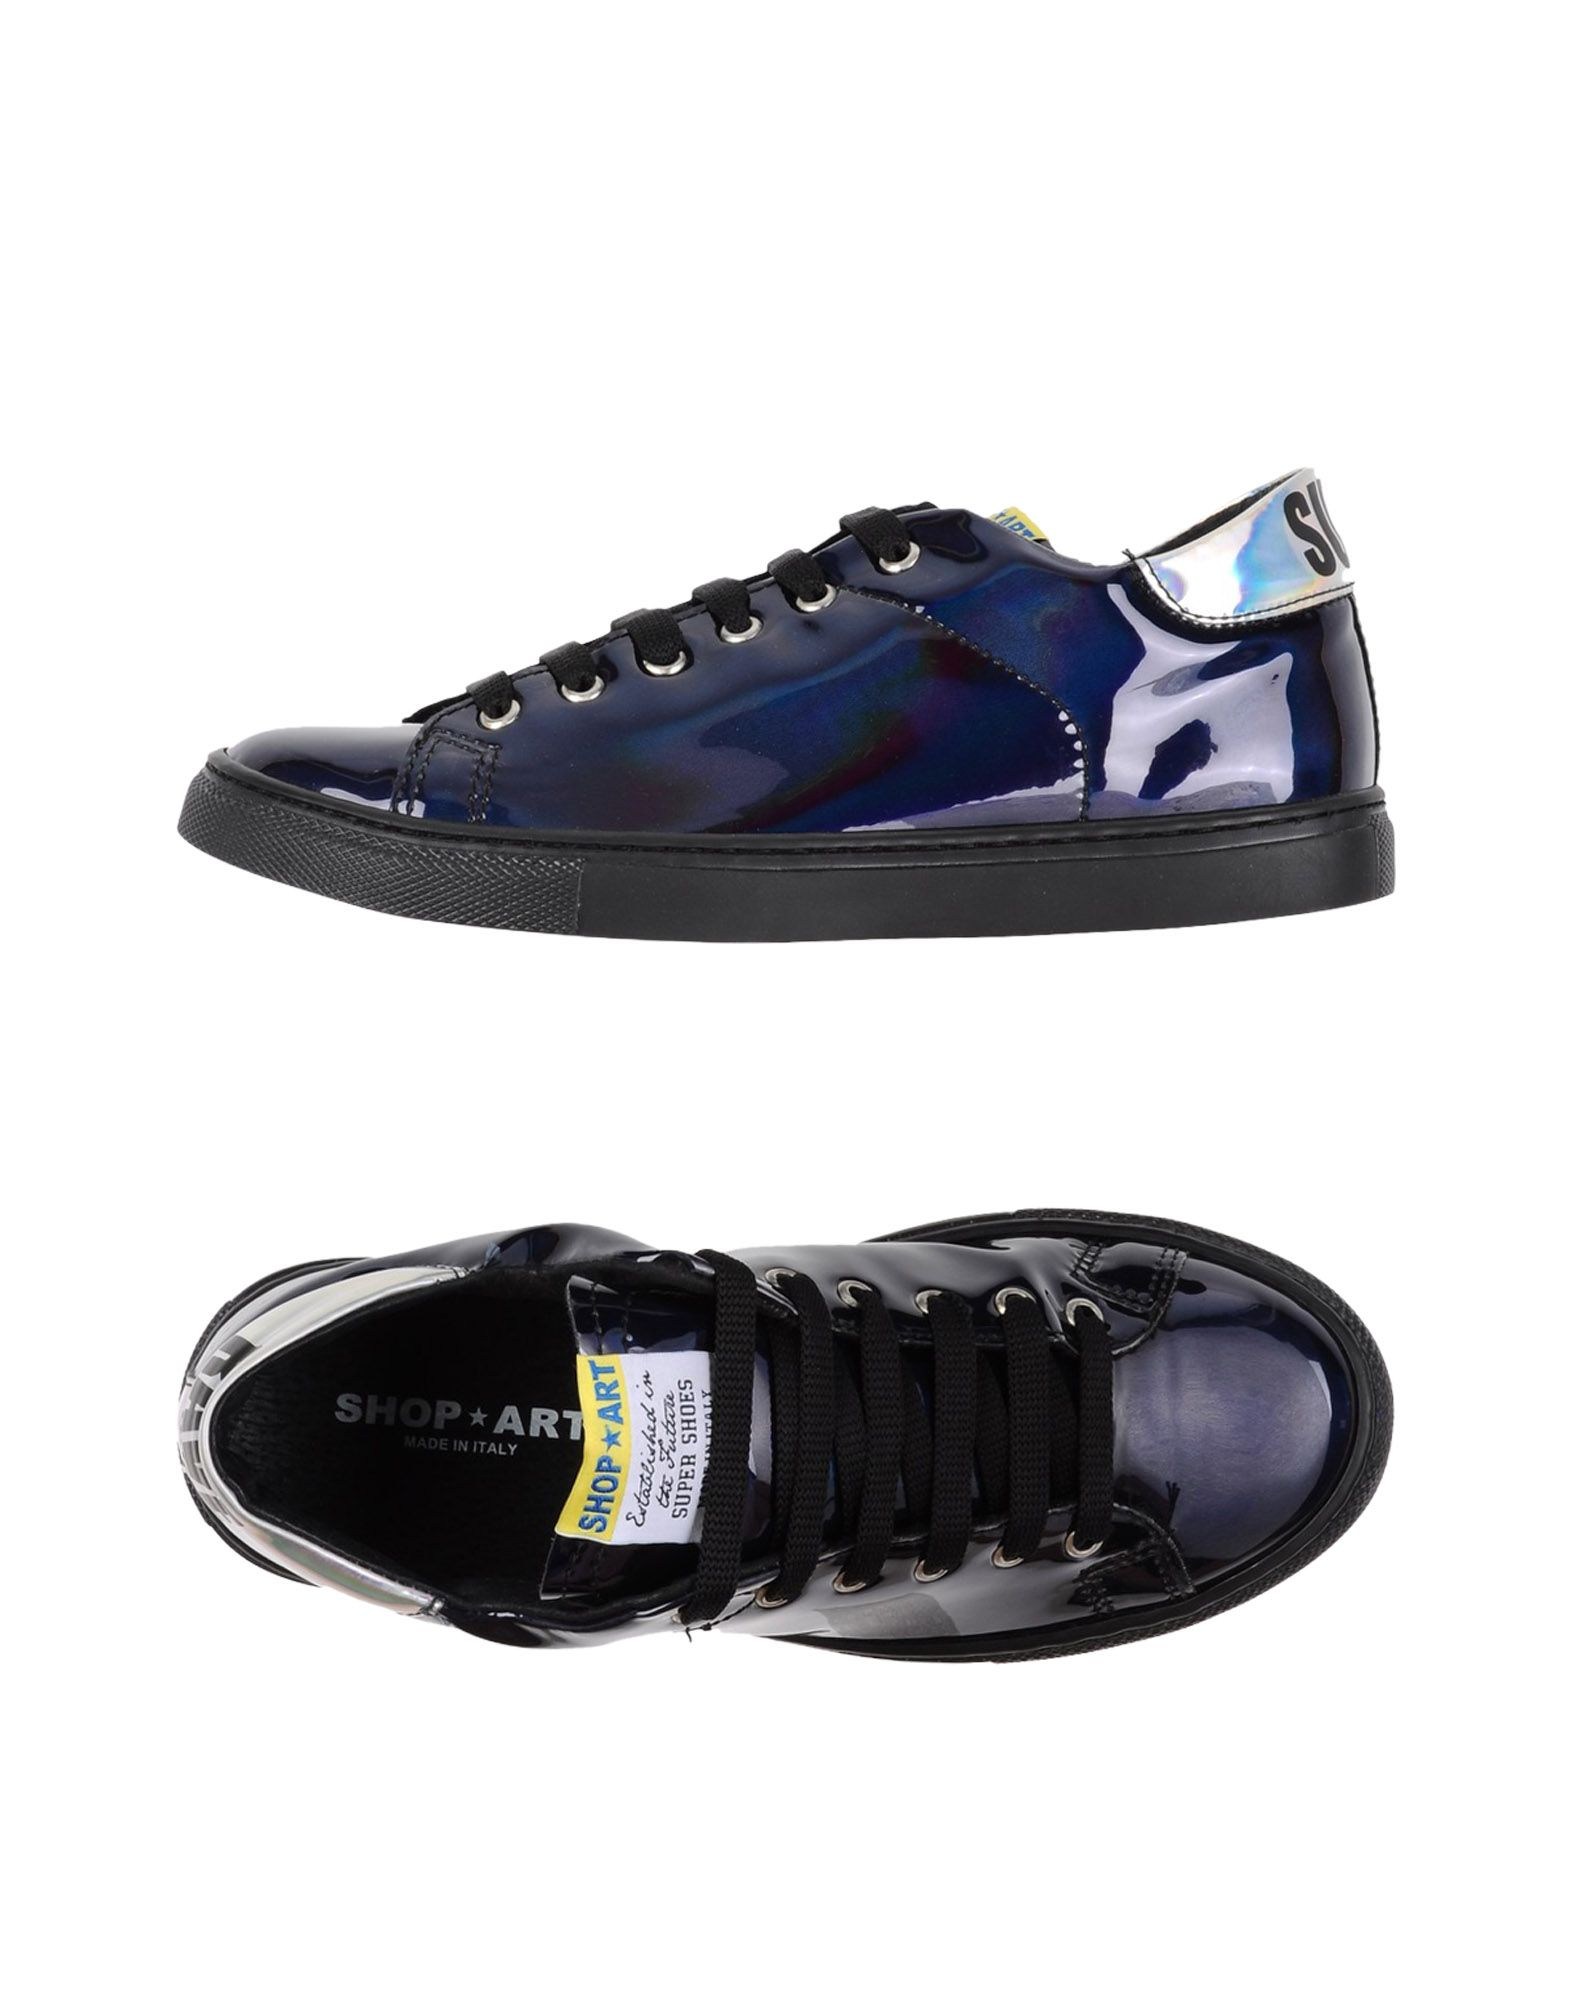 Sneakers Shop ★ Art Donna - 11139332TU